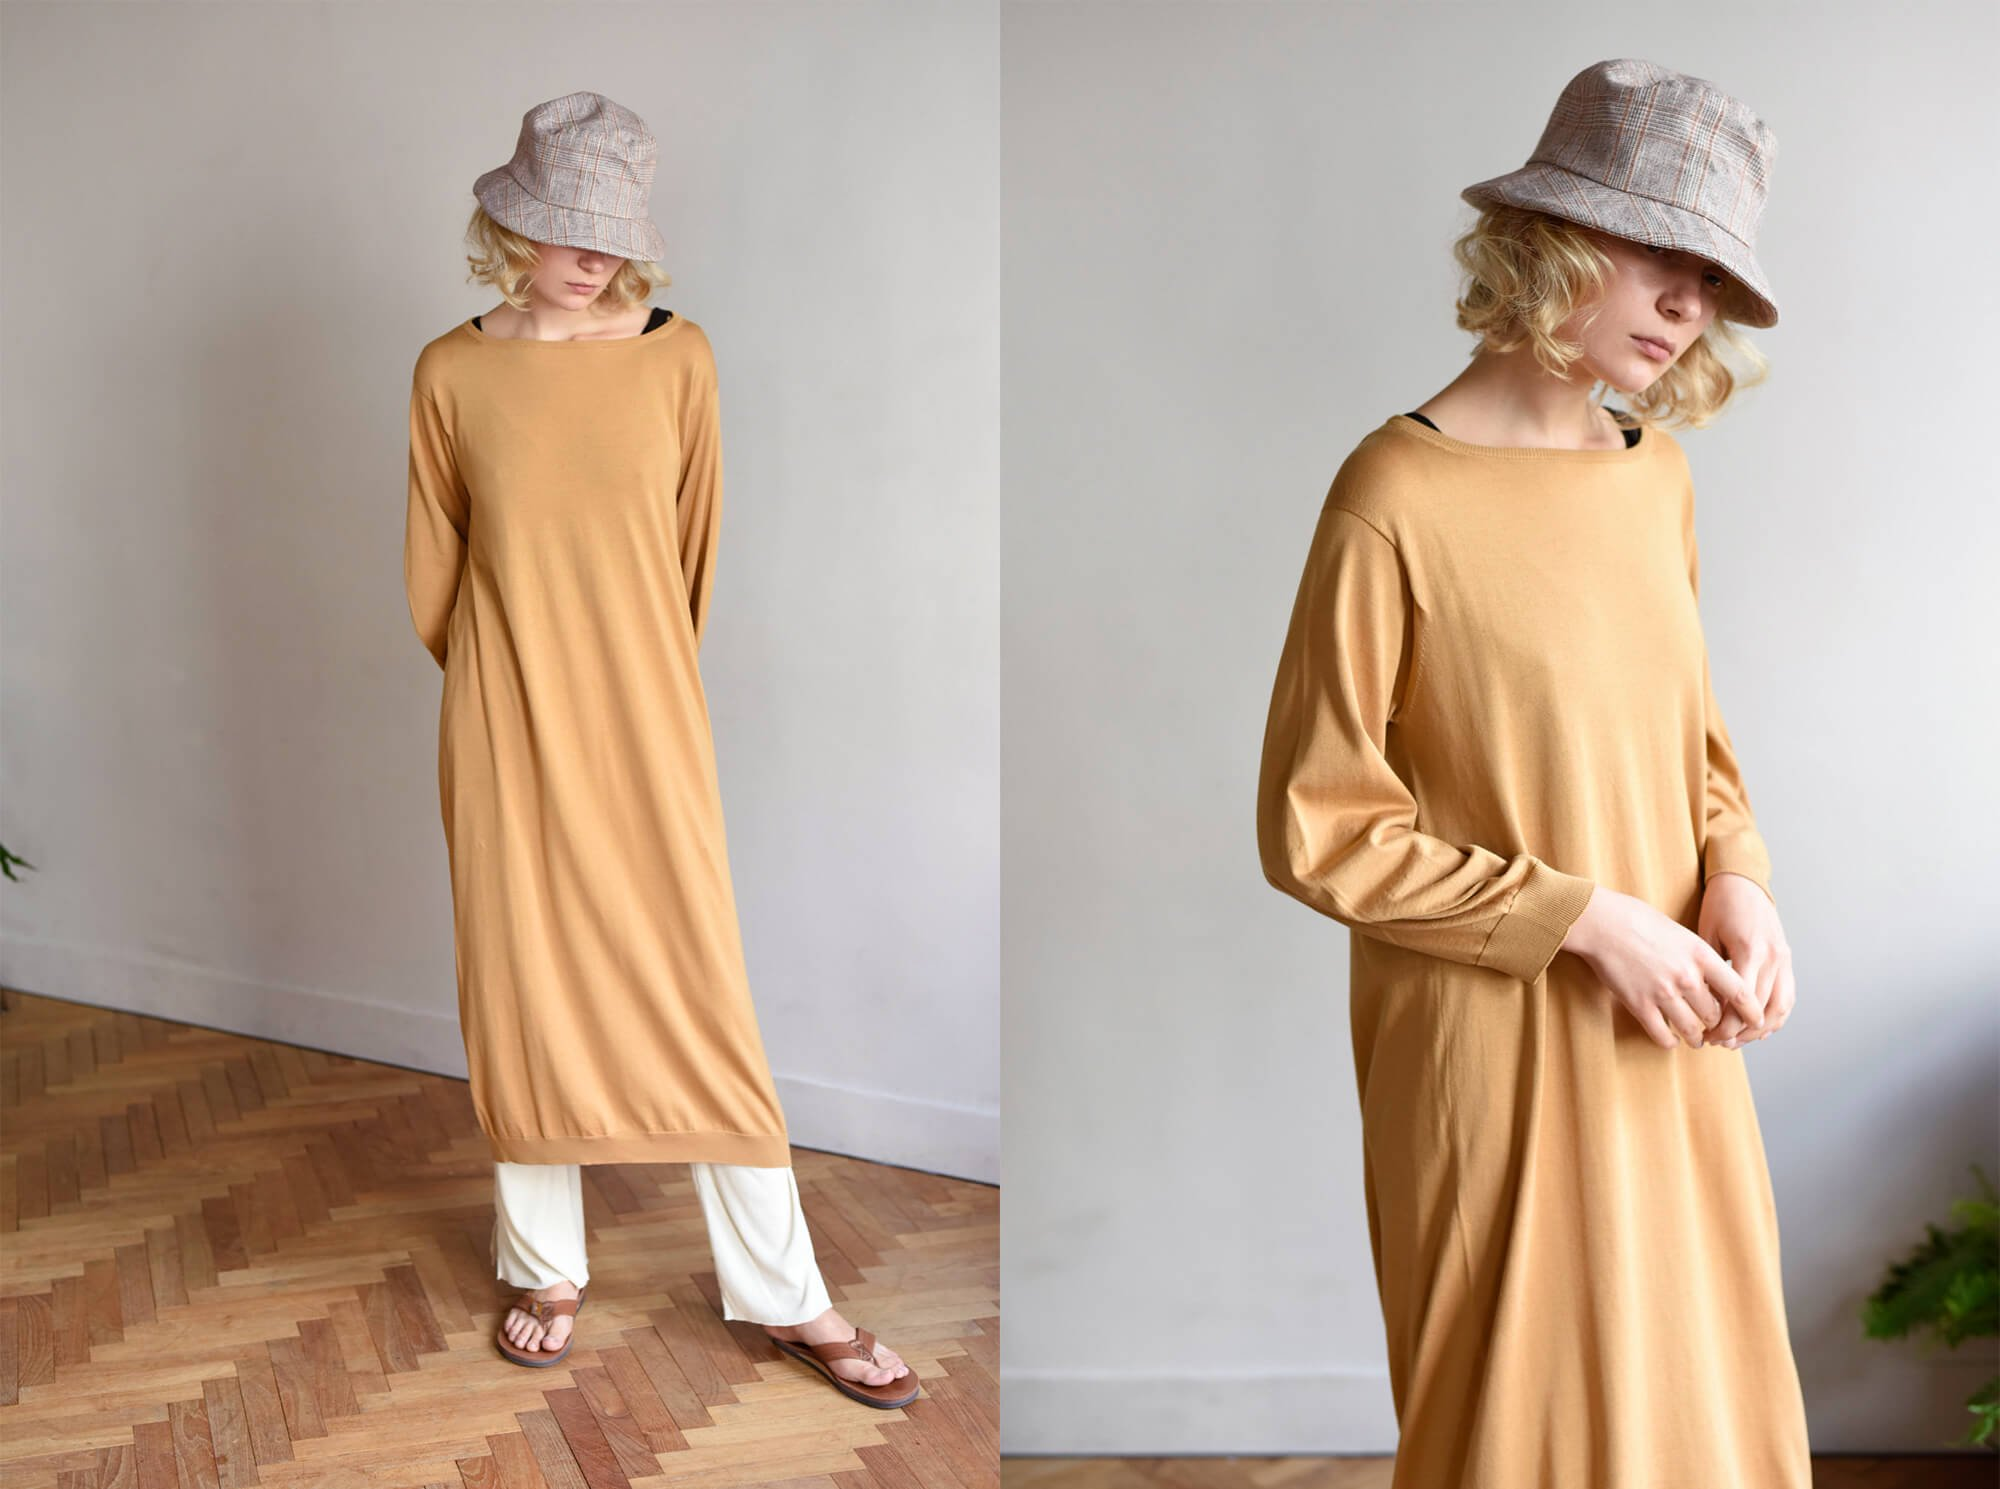 egyptian cotton fine gauge-knit dress